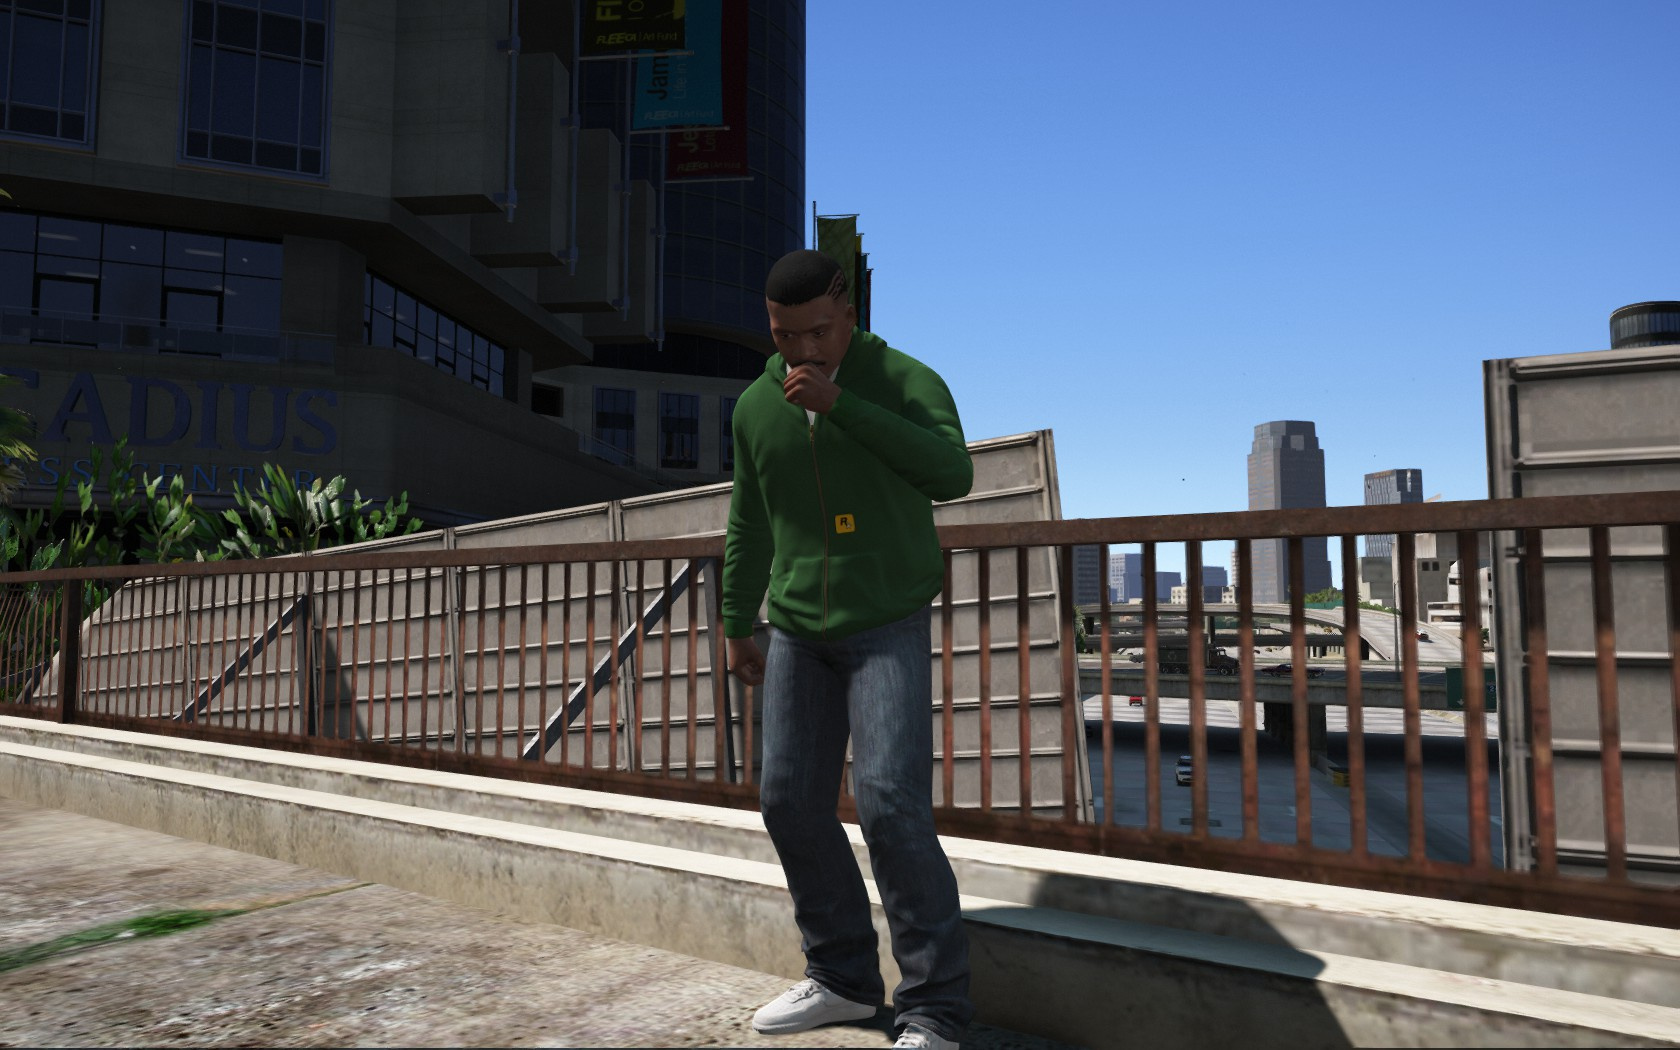 Rockstar Games blasts random made-up Grand Theft Auto drama